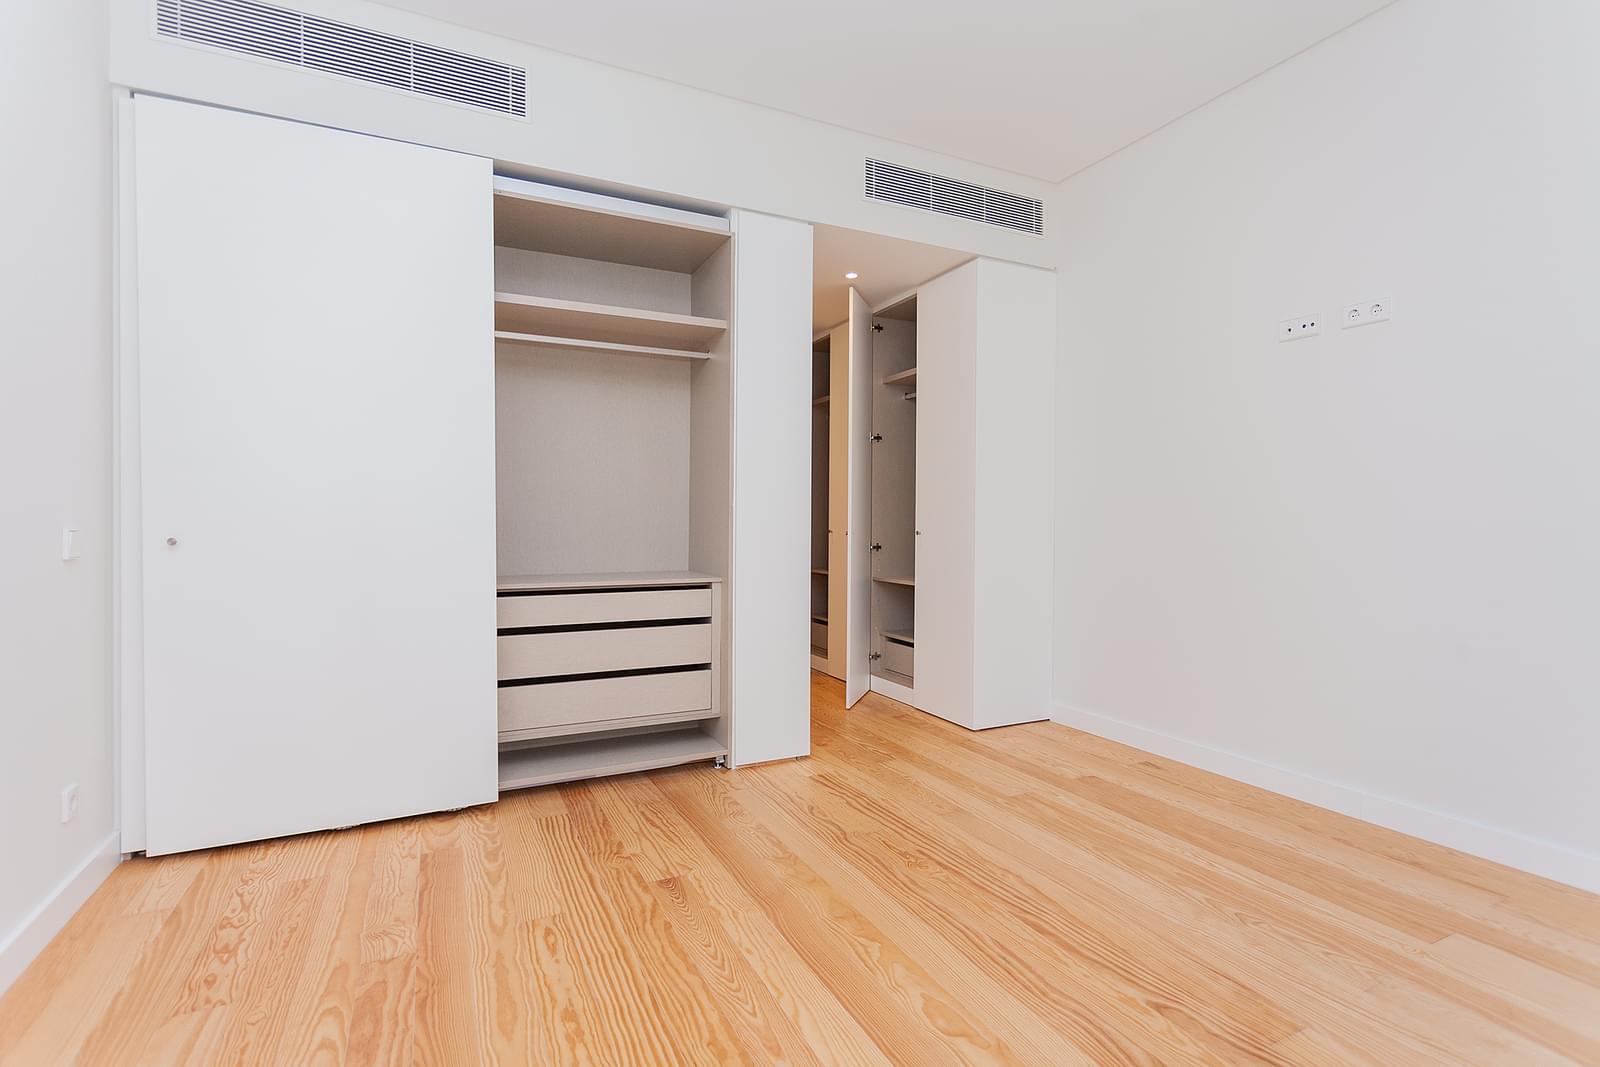 PF22532, Apartamento T2, Lisboa